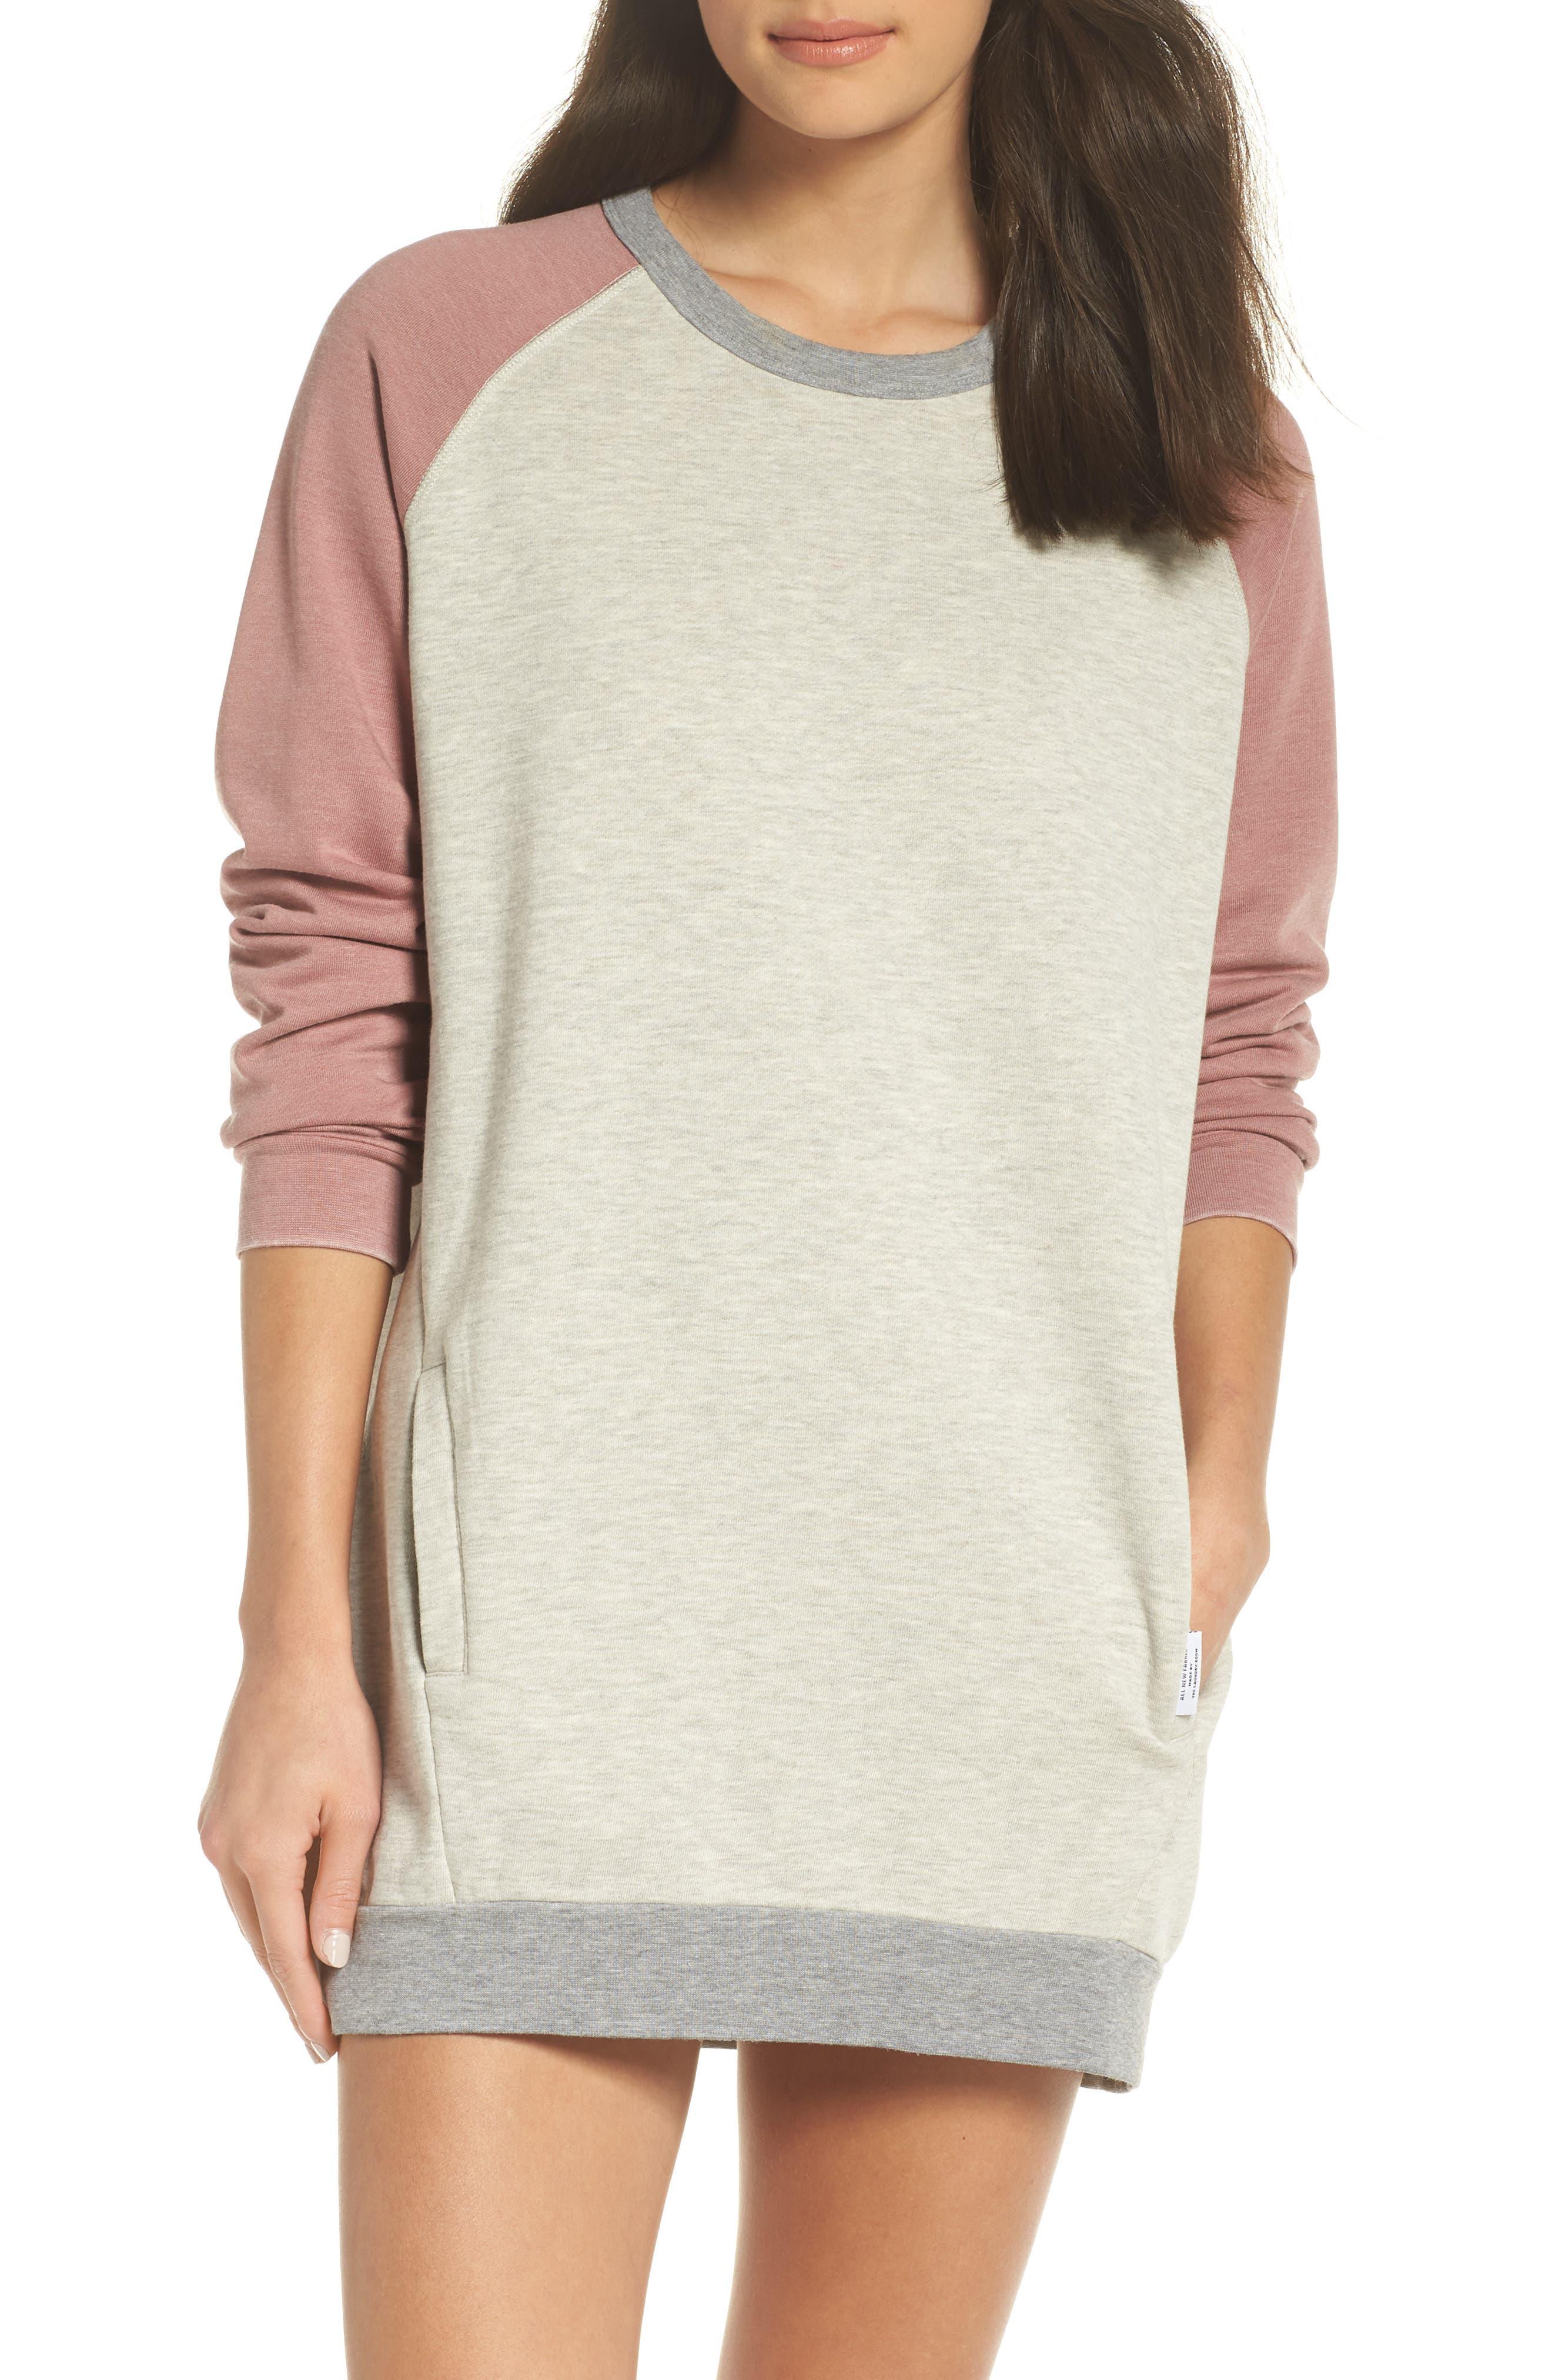 Lounge Sweatshirt Dress,                         Main,                         color, PEBBLE HEATHER / MAUVE